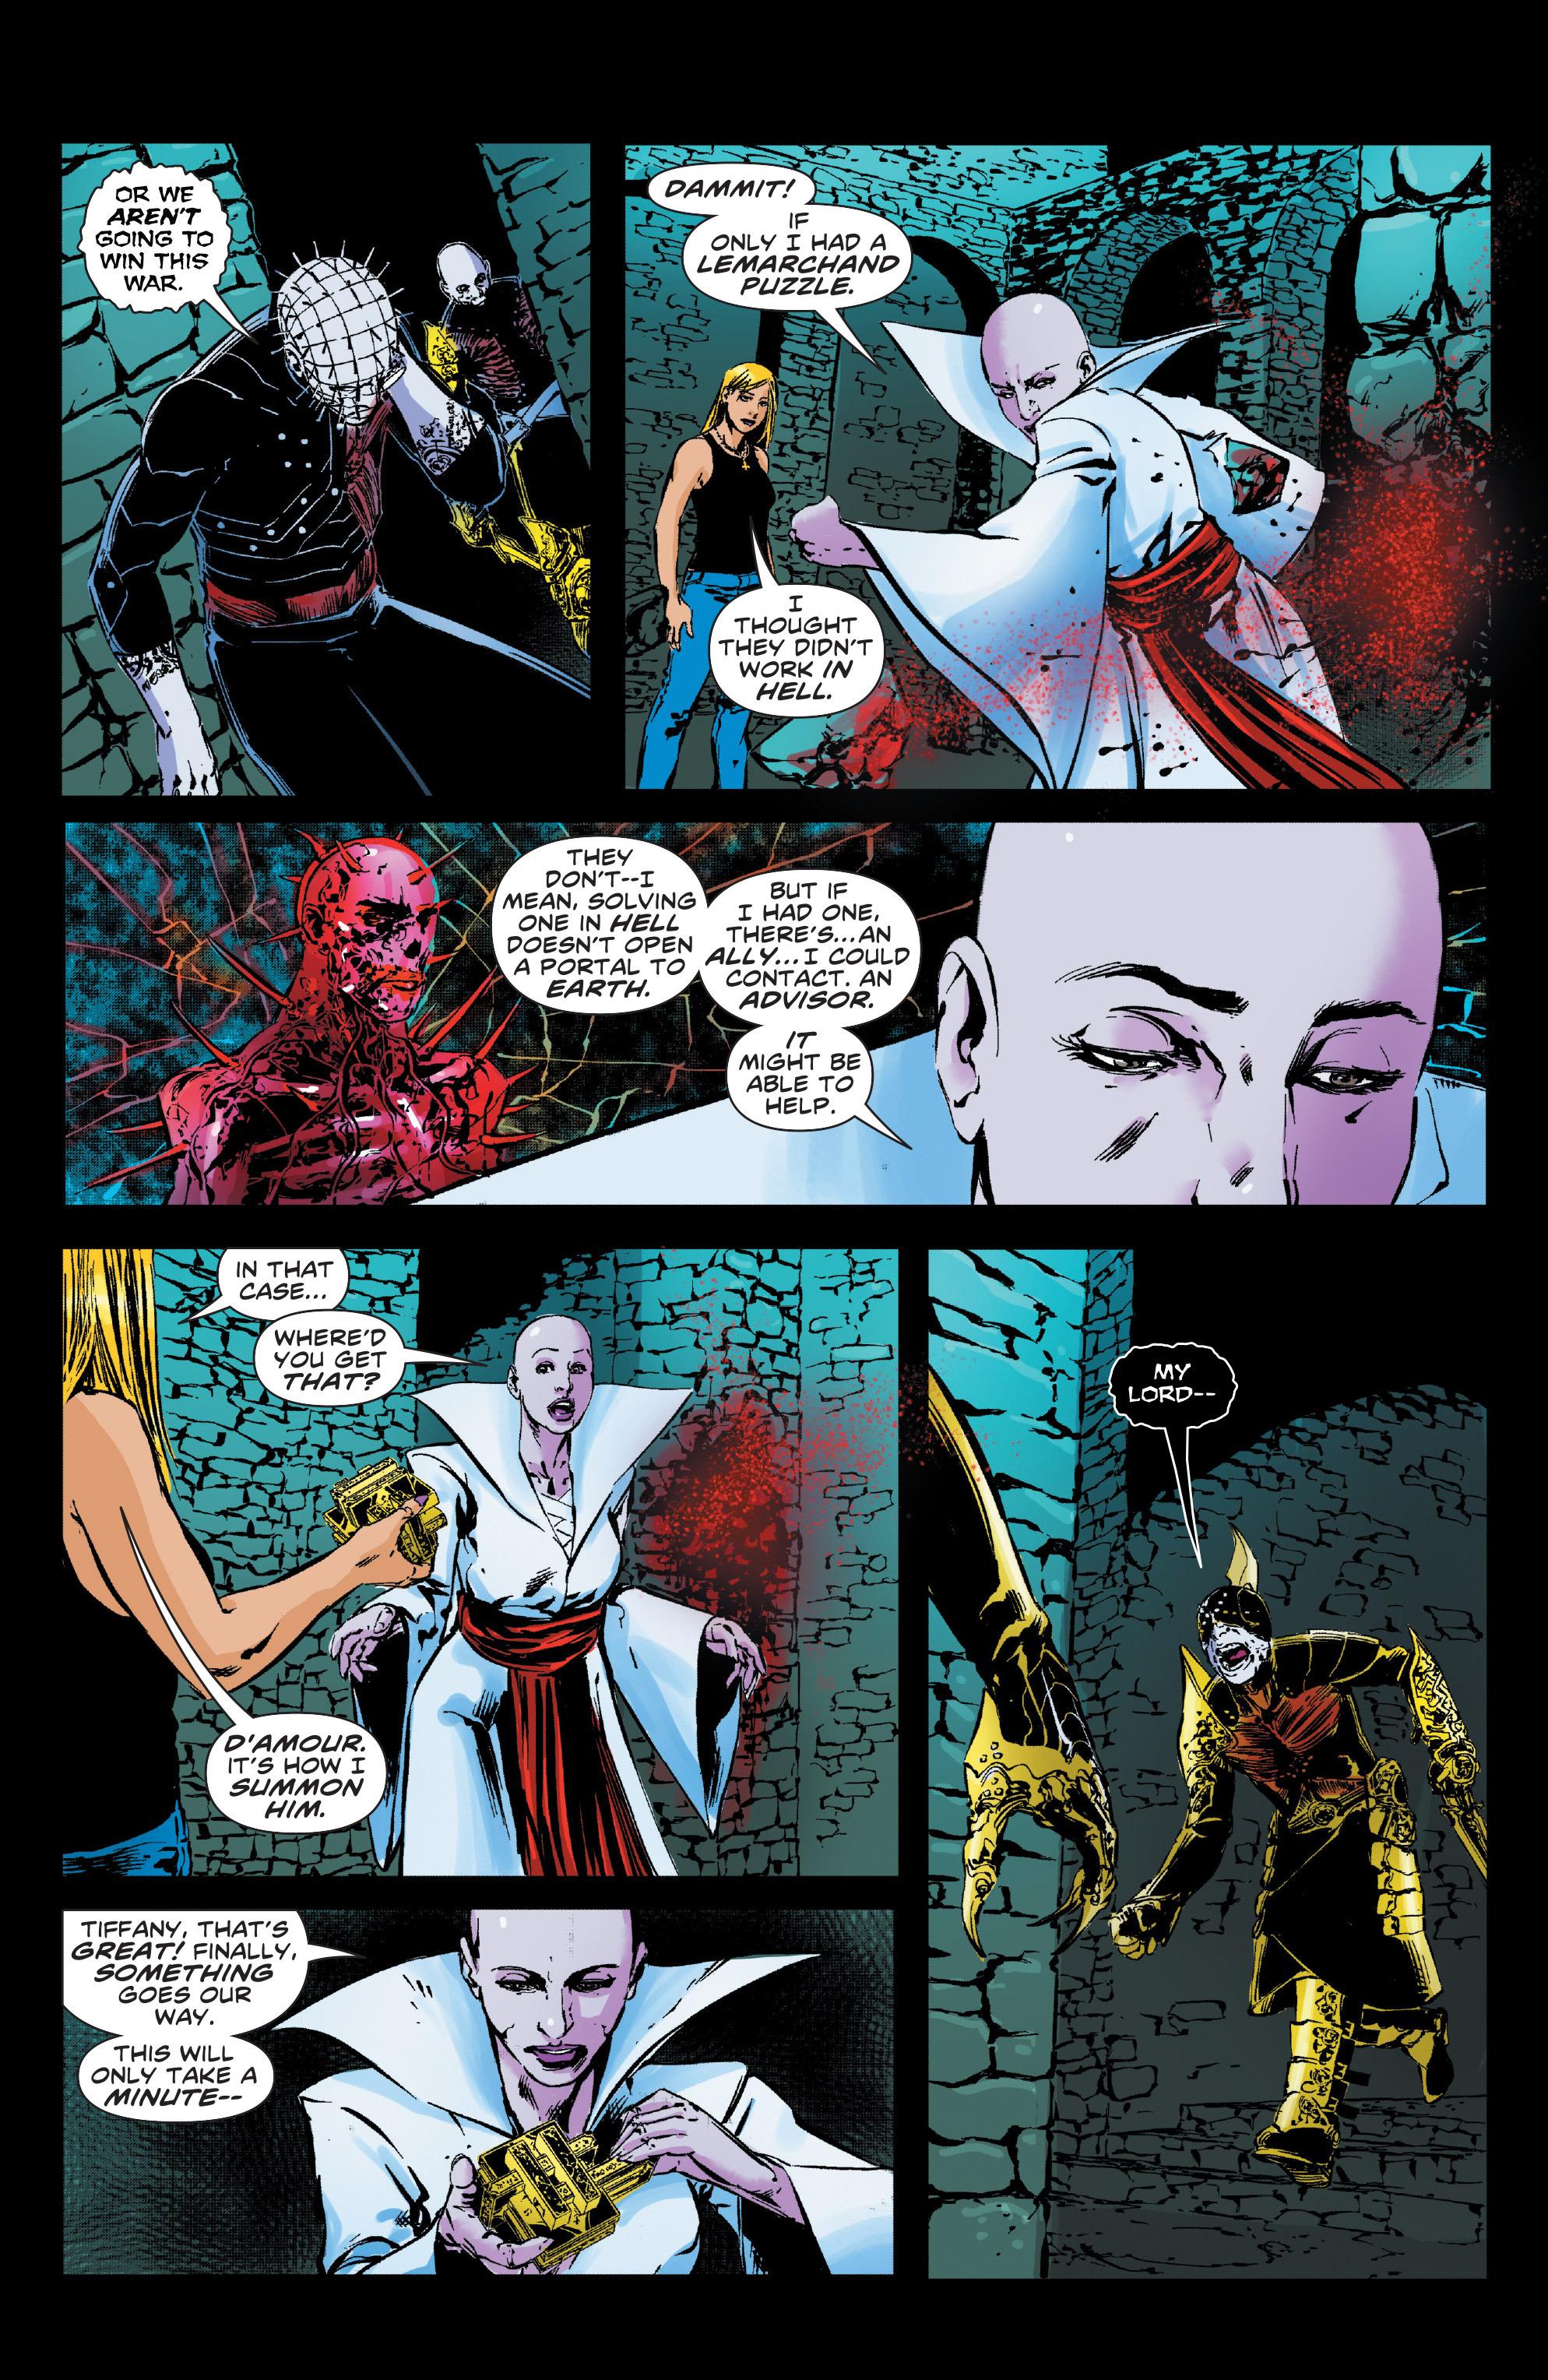 Read online Clive Barker's Hellraiser: The Dark Watch comic -  Issue # TPB 3 - 85